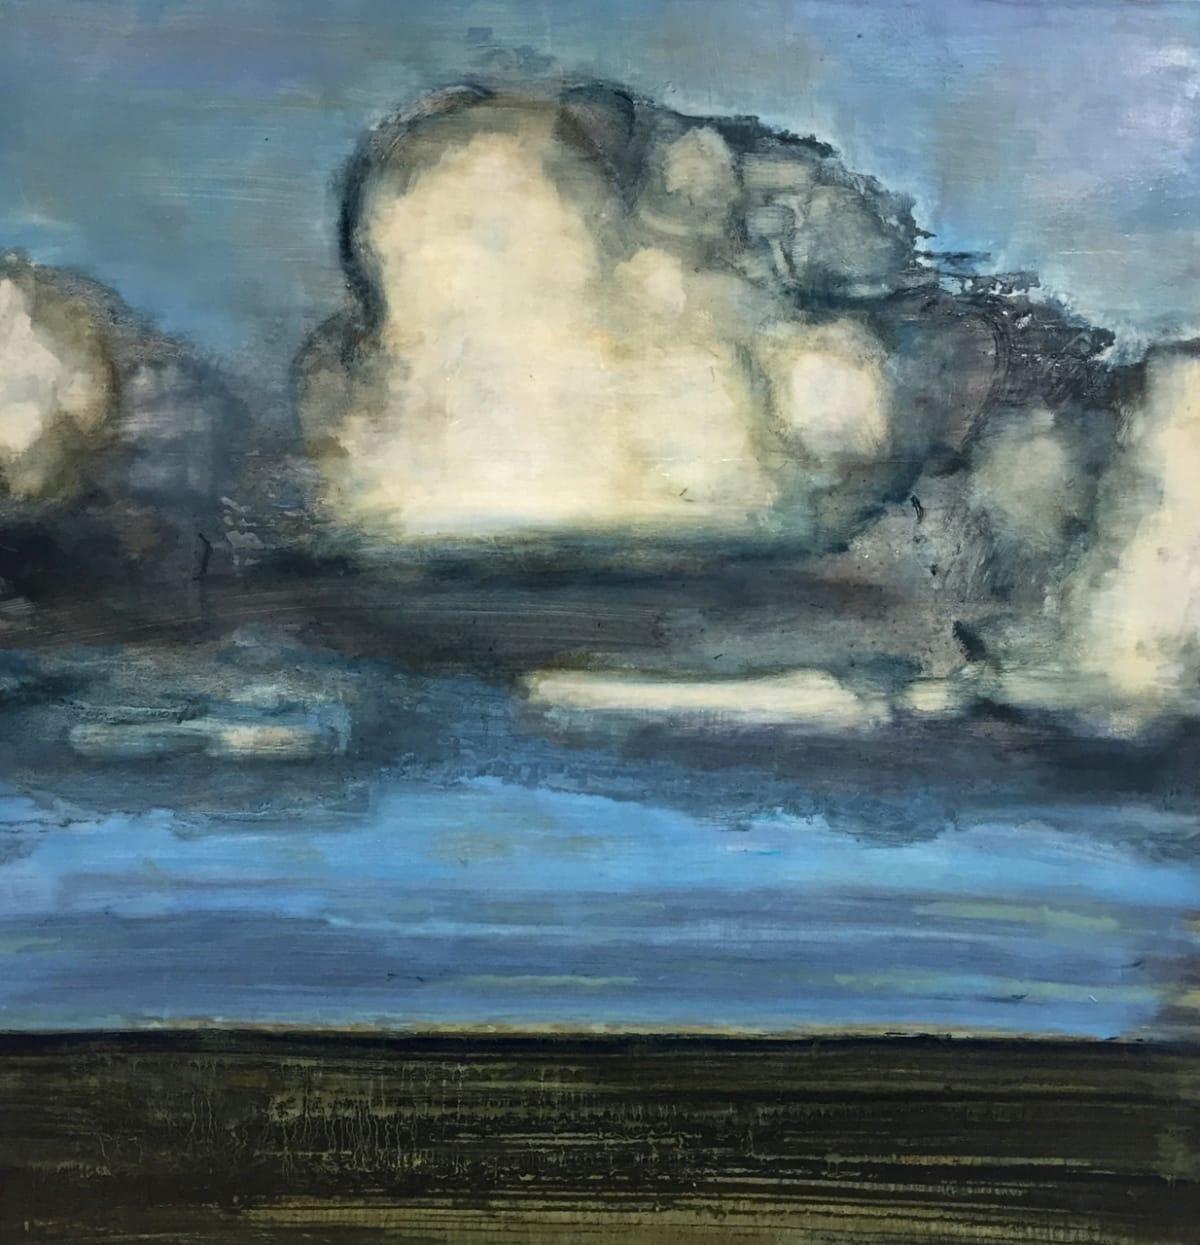 David Konigsberg, Field Late Afternoon, 2018